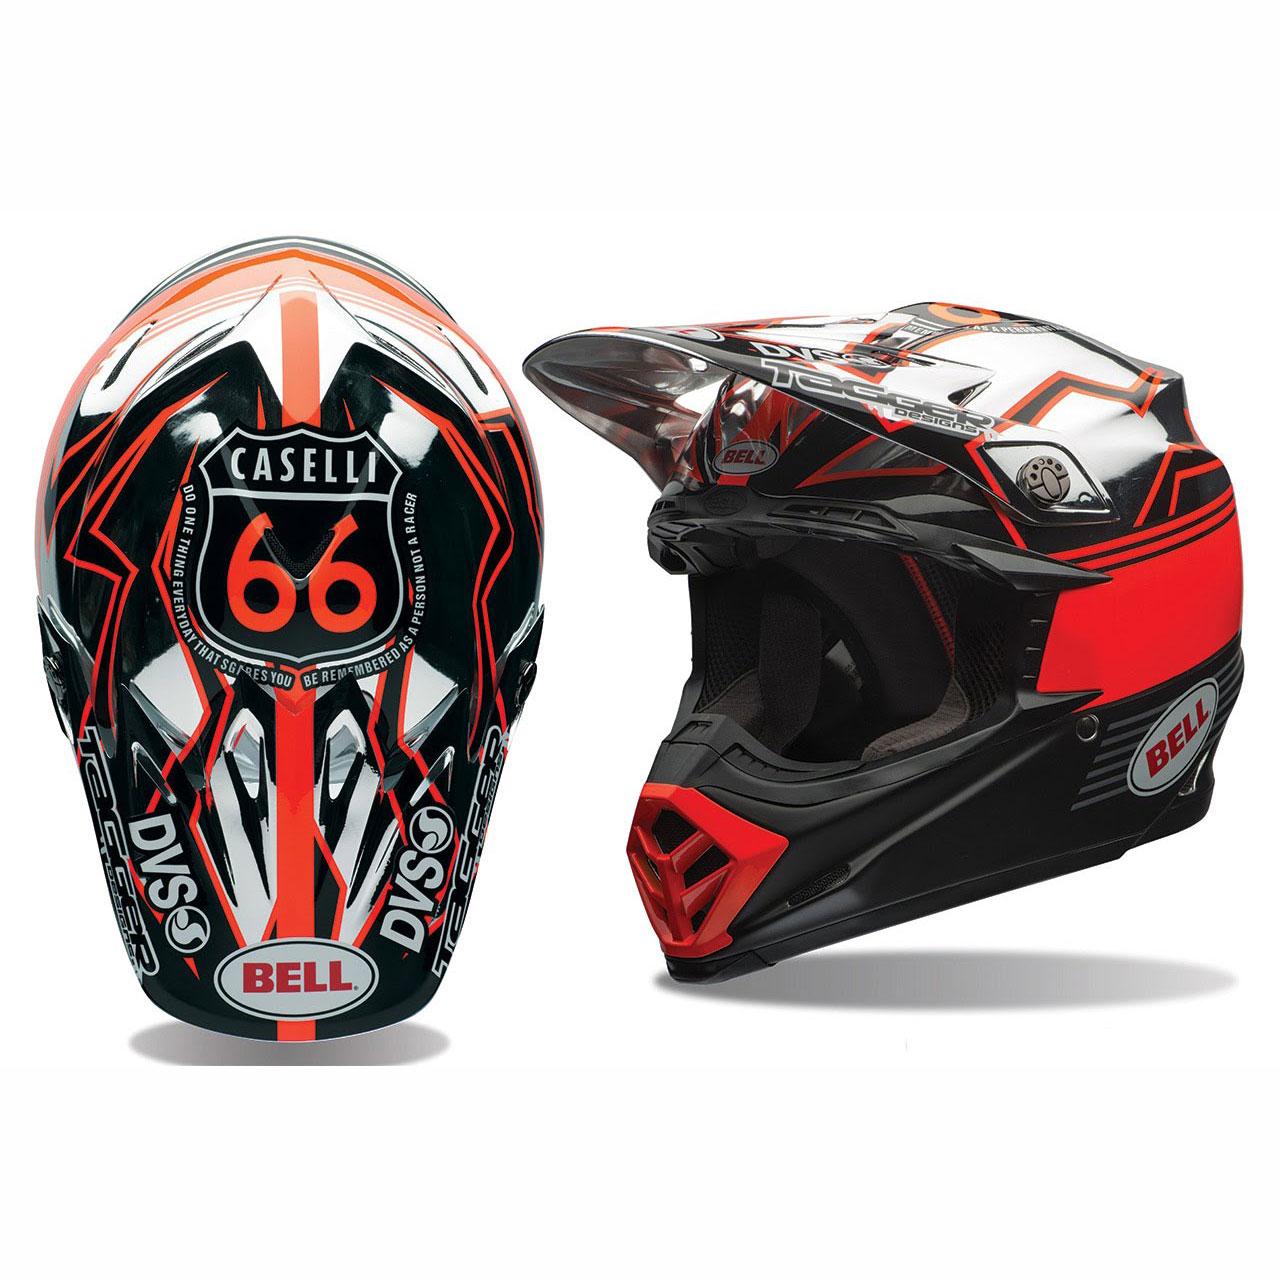 Caselli-helmet.jpg